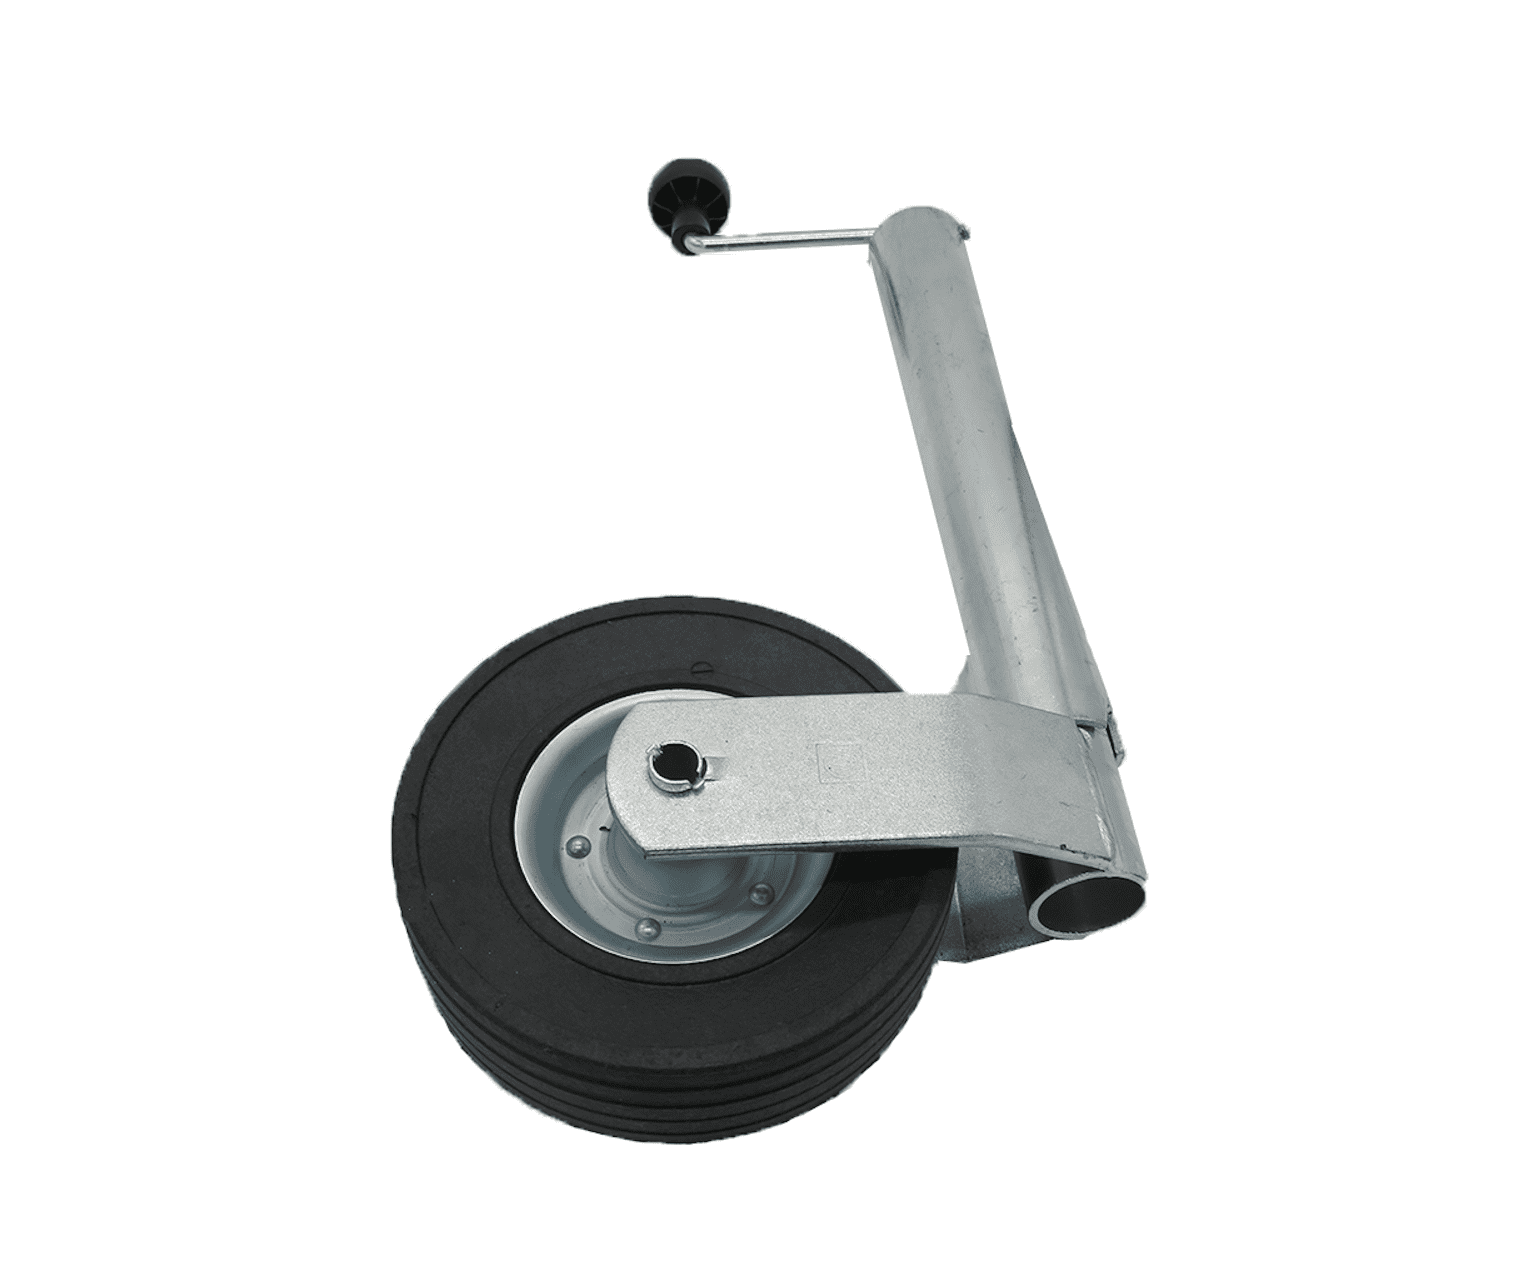 Stützrad II ohne Klemmschelle ab 1200 - 1600